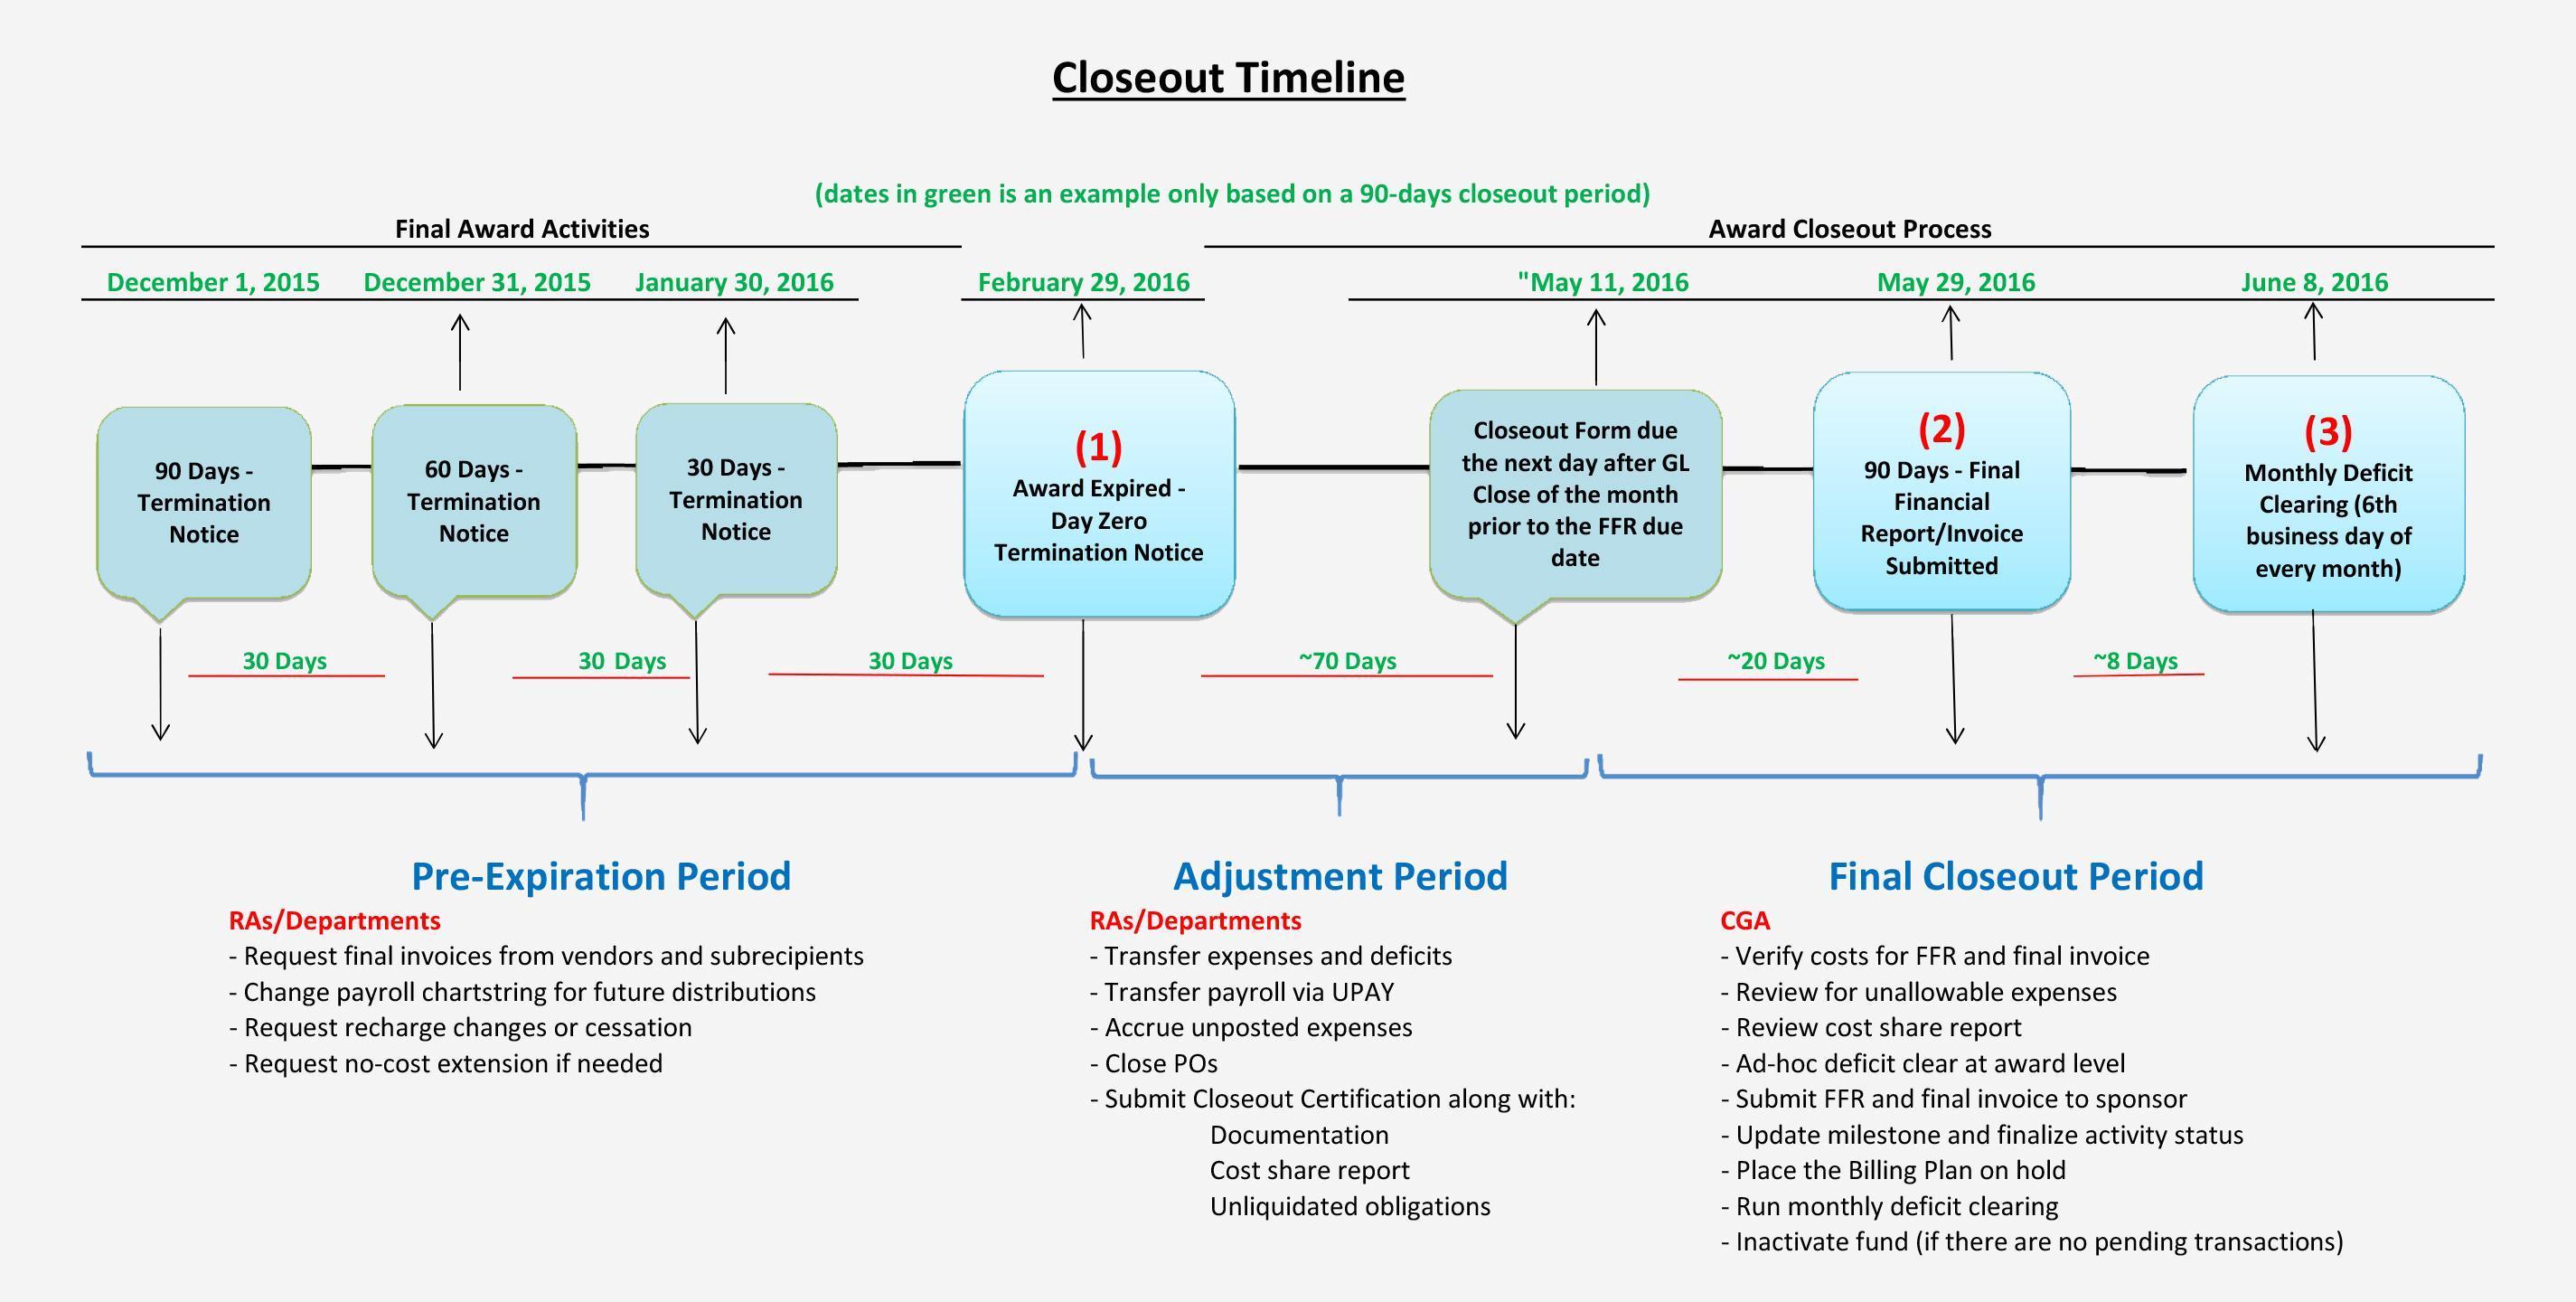 Award closeout timeline